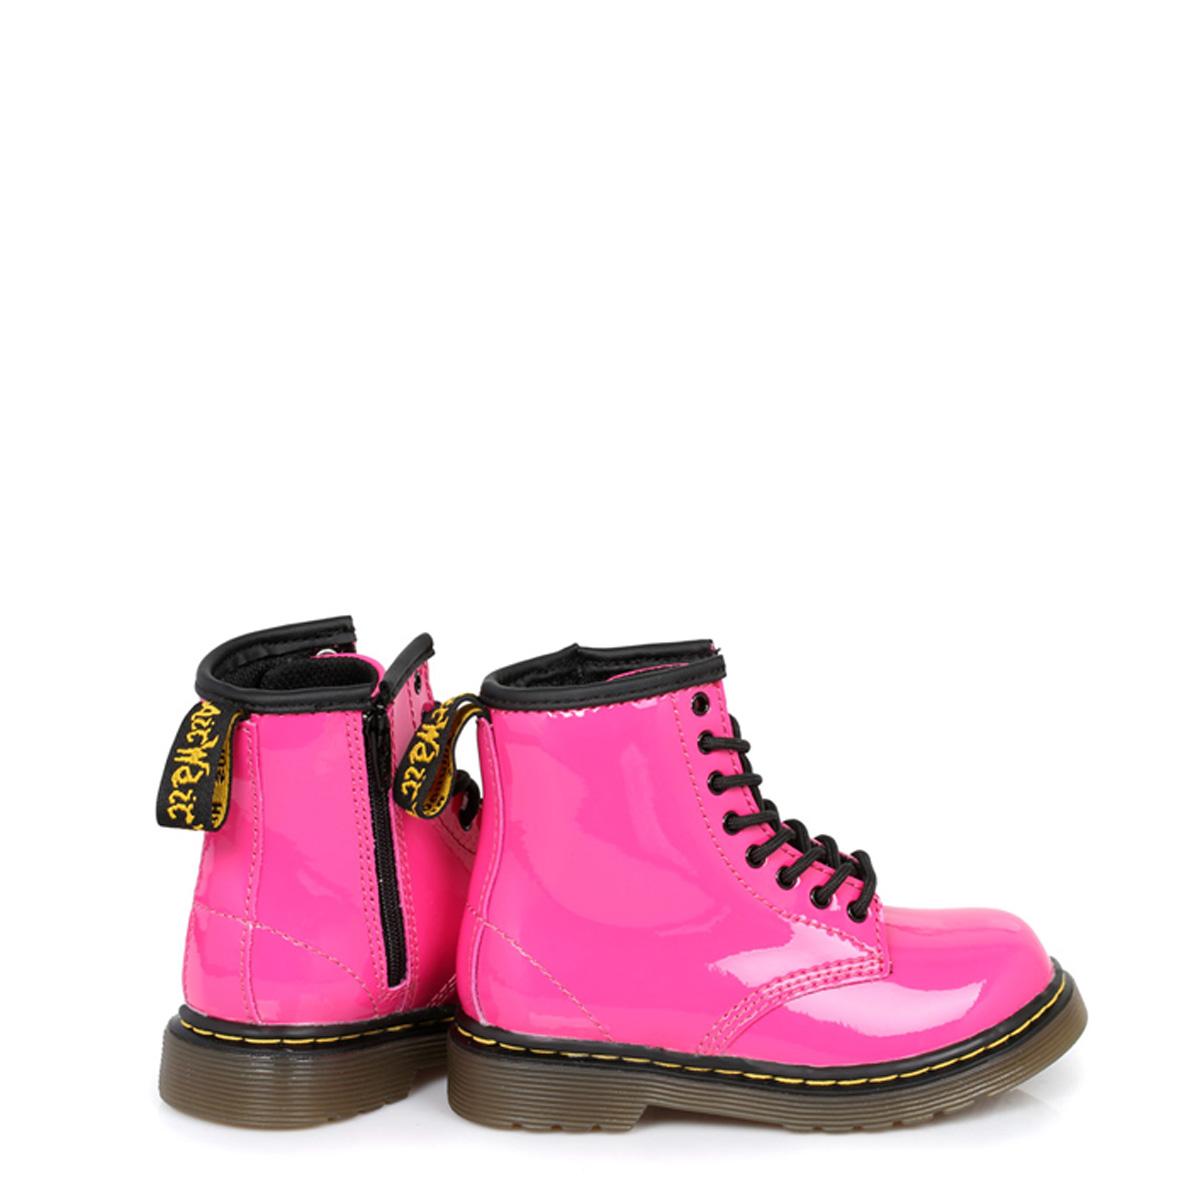 doc martens boots kids